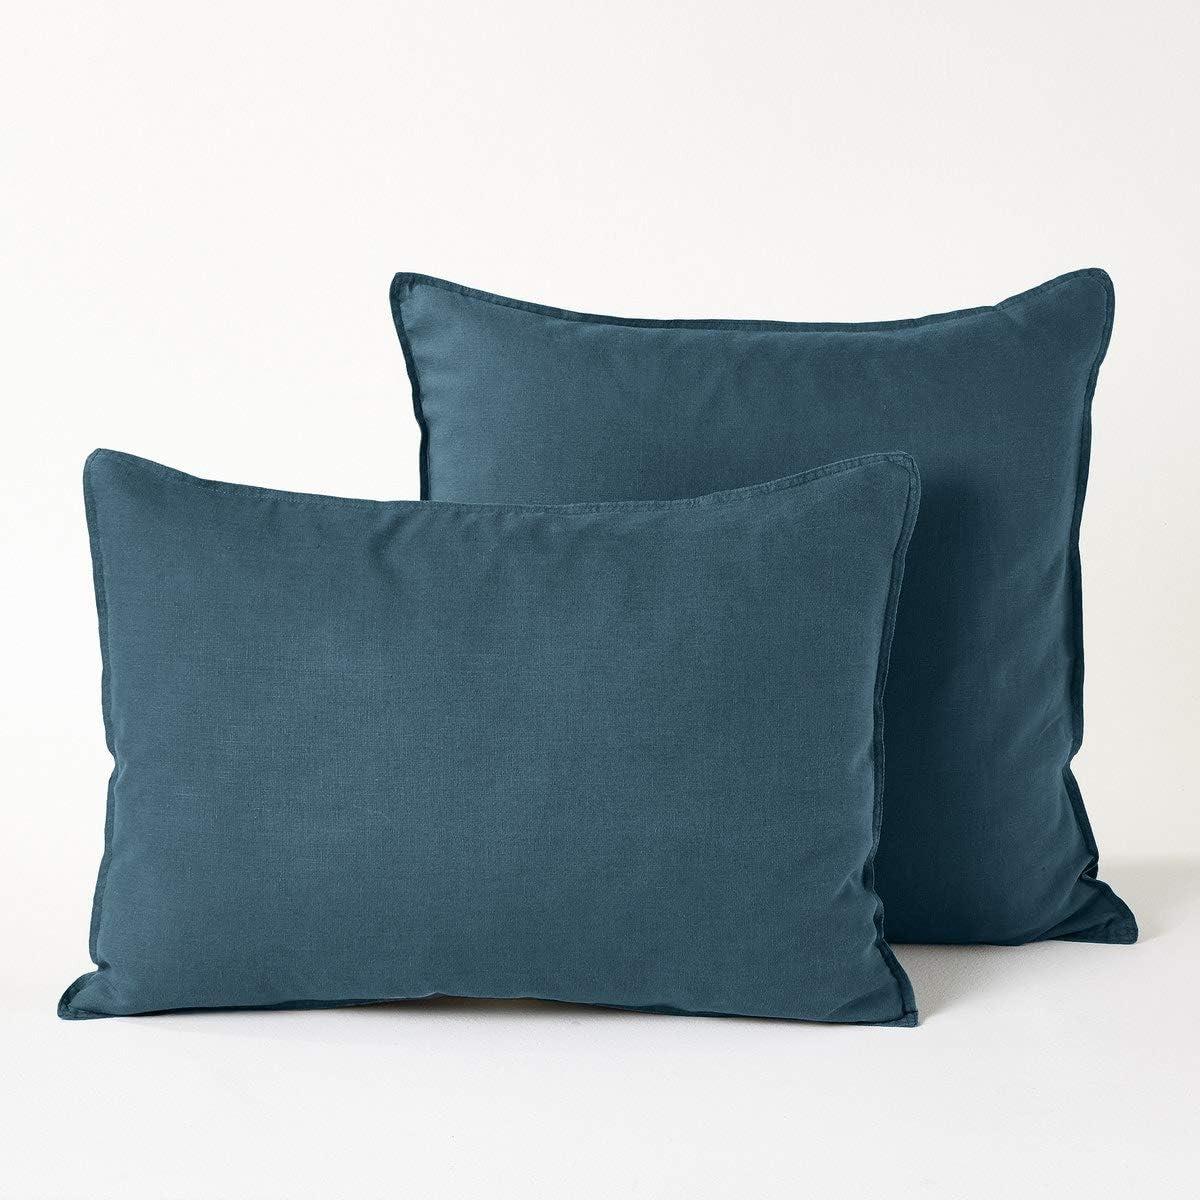 La Redoute Am.PM Pillowcase for Pillow